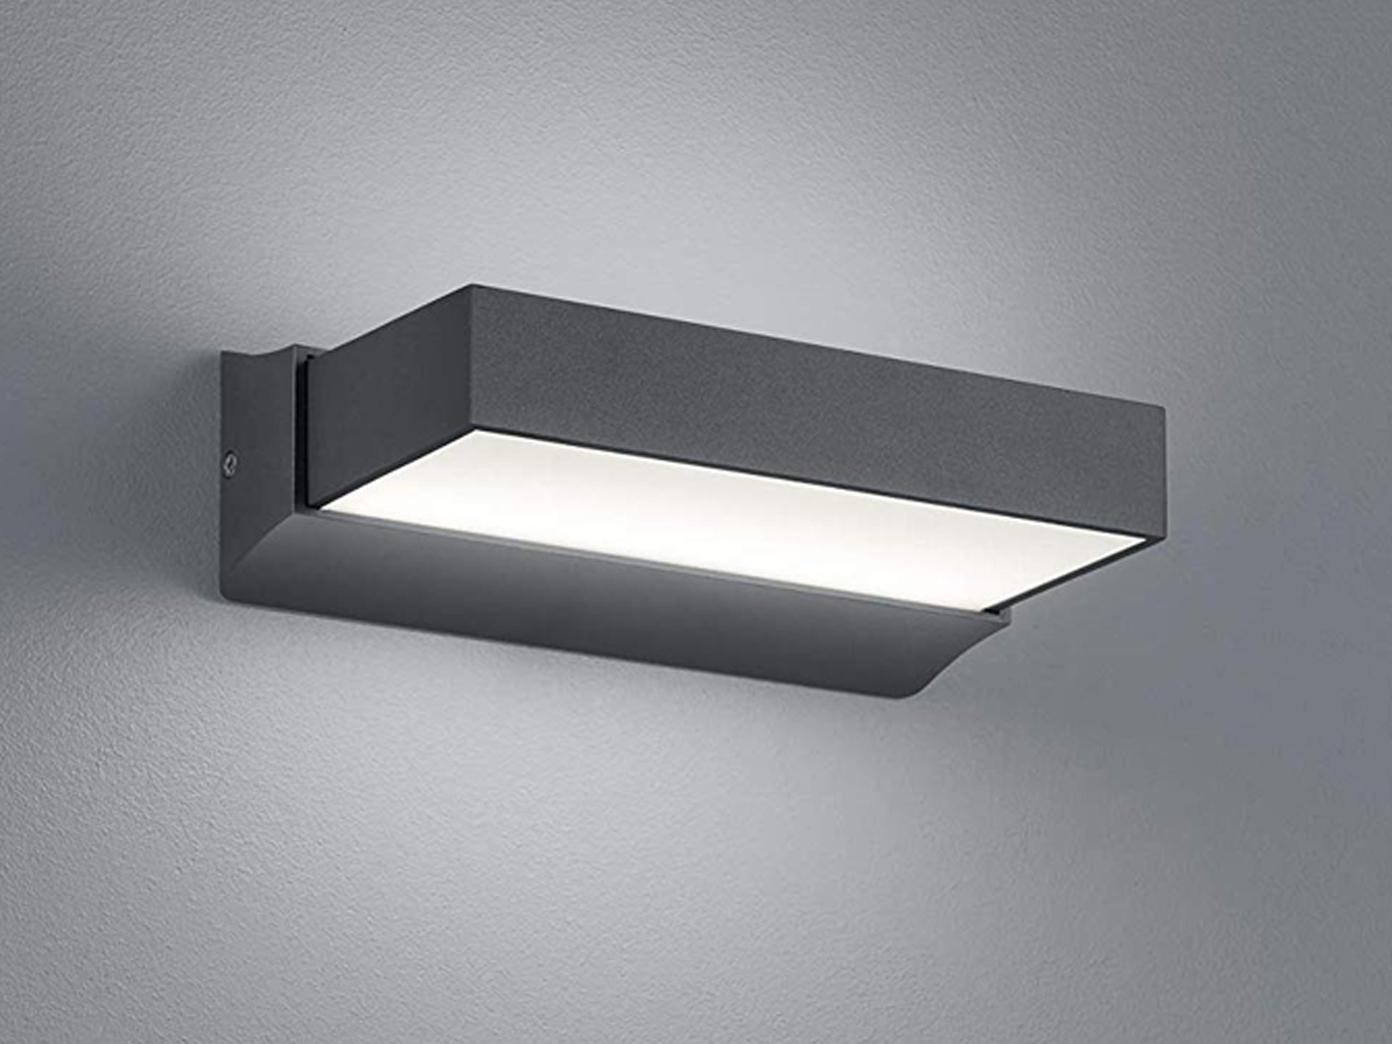 LED Außenwandlampe ALU in anthrazit up & down Carport Beleuchtung IP65 Höhe 7cm